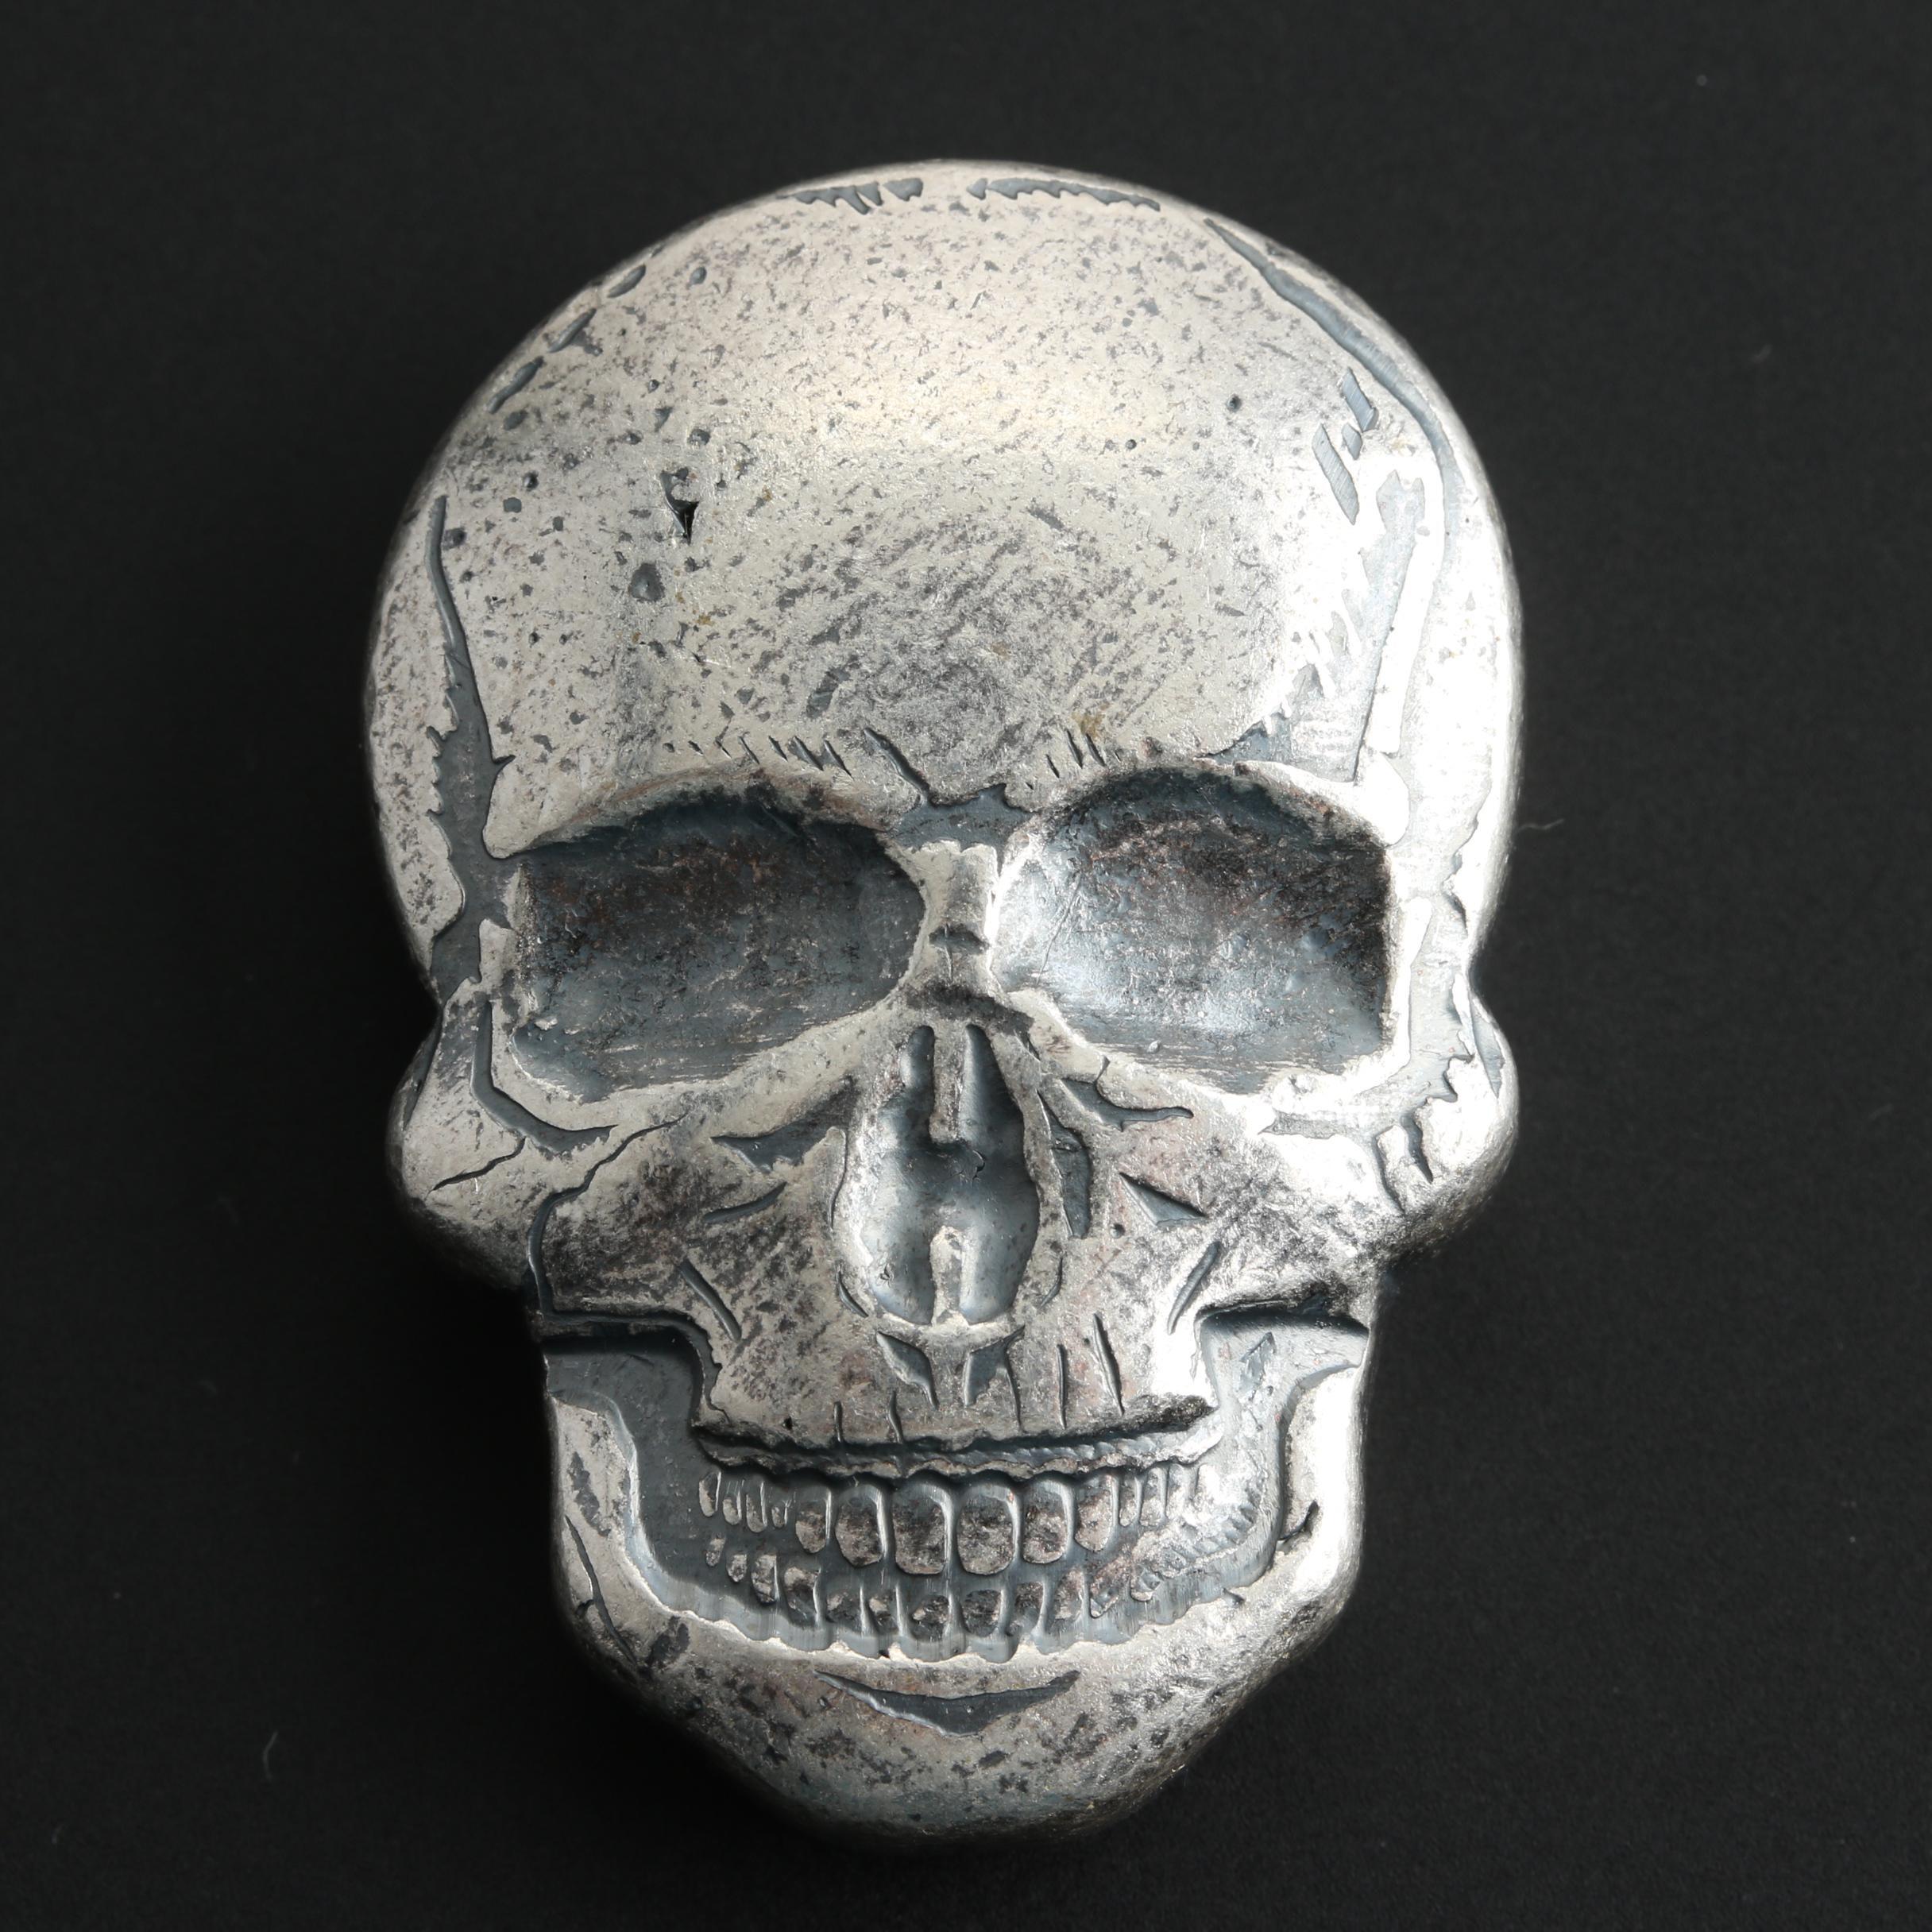 Skull Shaped 2 Troy Ounce .999 Fine Silver Bar